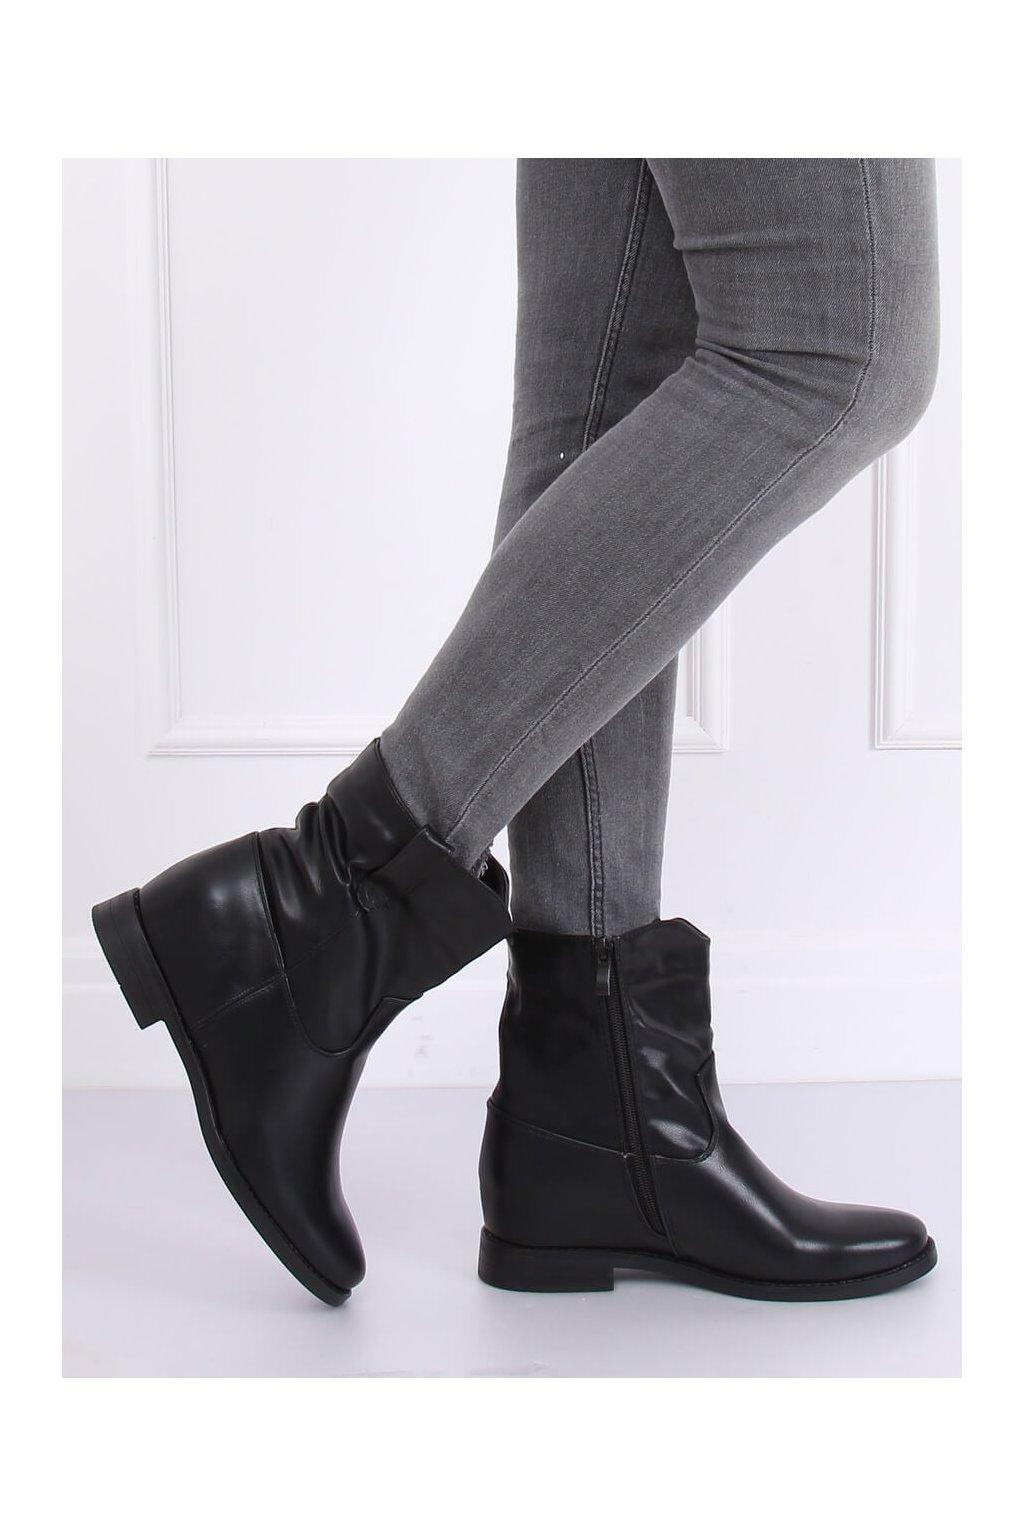 Dámske členkové topánky čierne na platforme G-7607